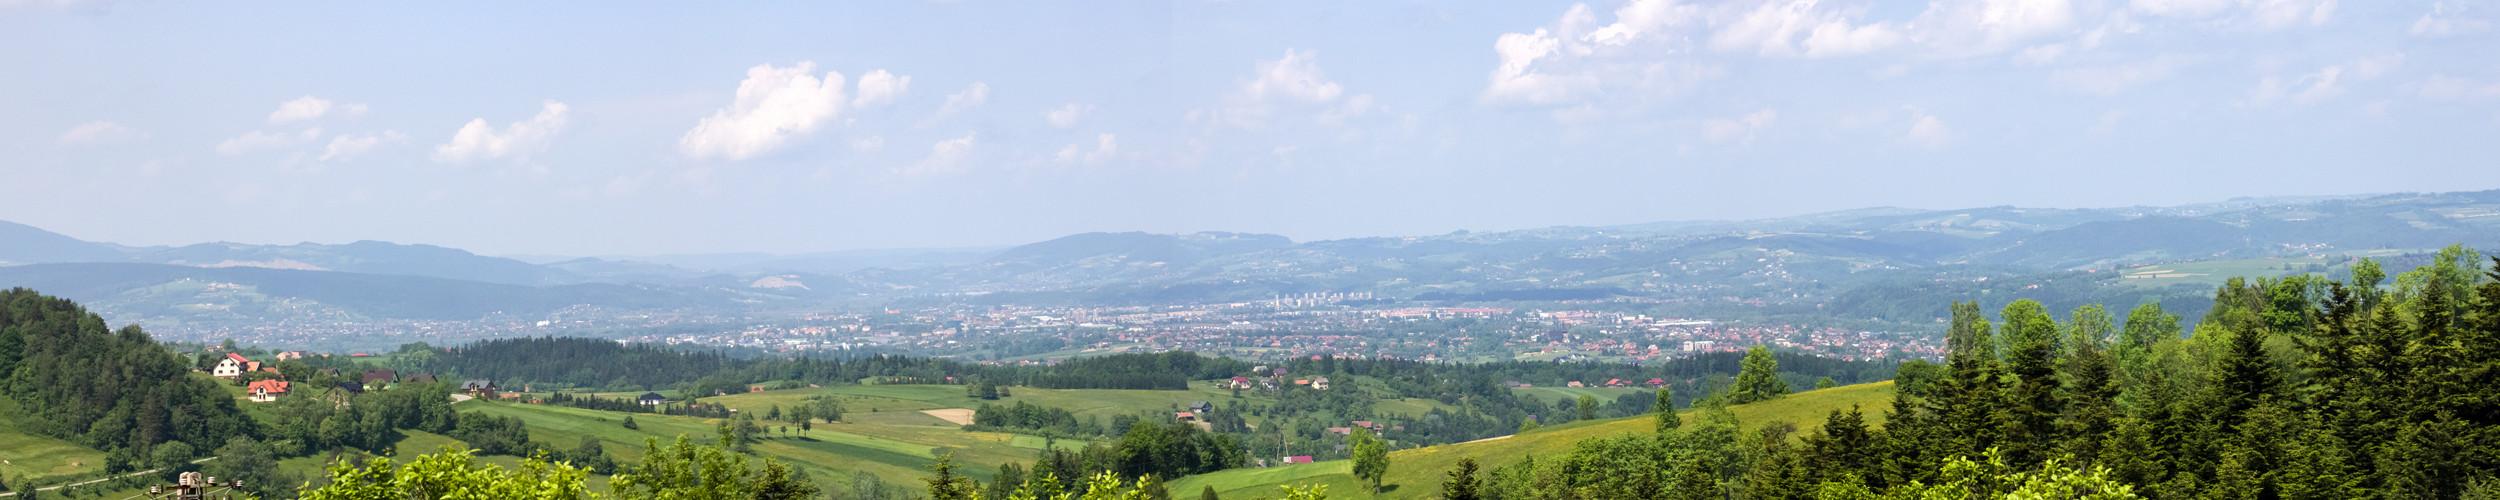 zel-panorama